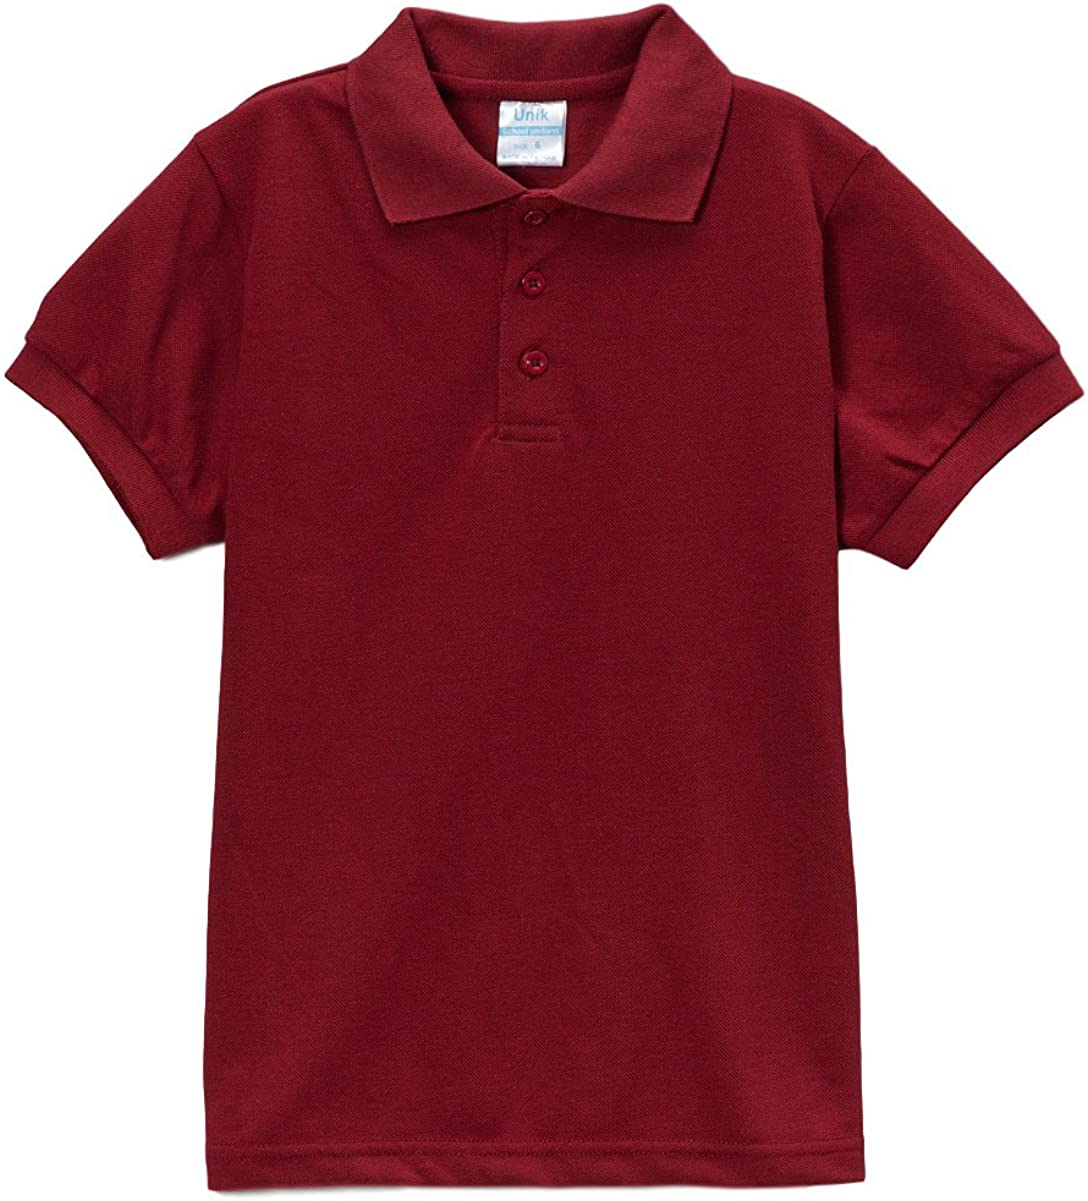 unik Boy's Uniform Pique Polo Shirt Short Sleeve White Sky Blue Navy Hunter Green Burgundy Black Red